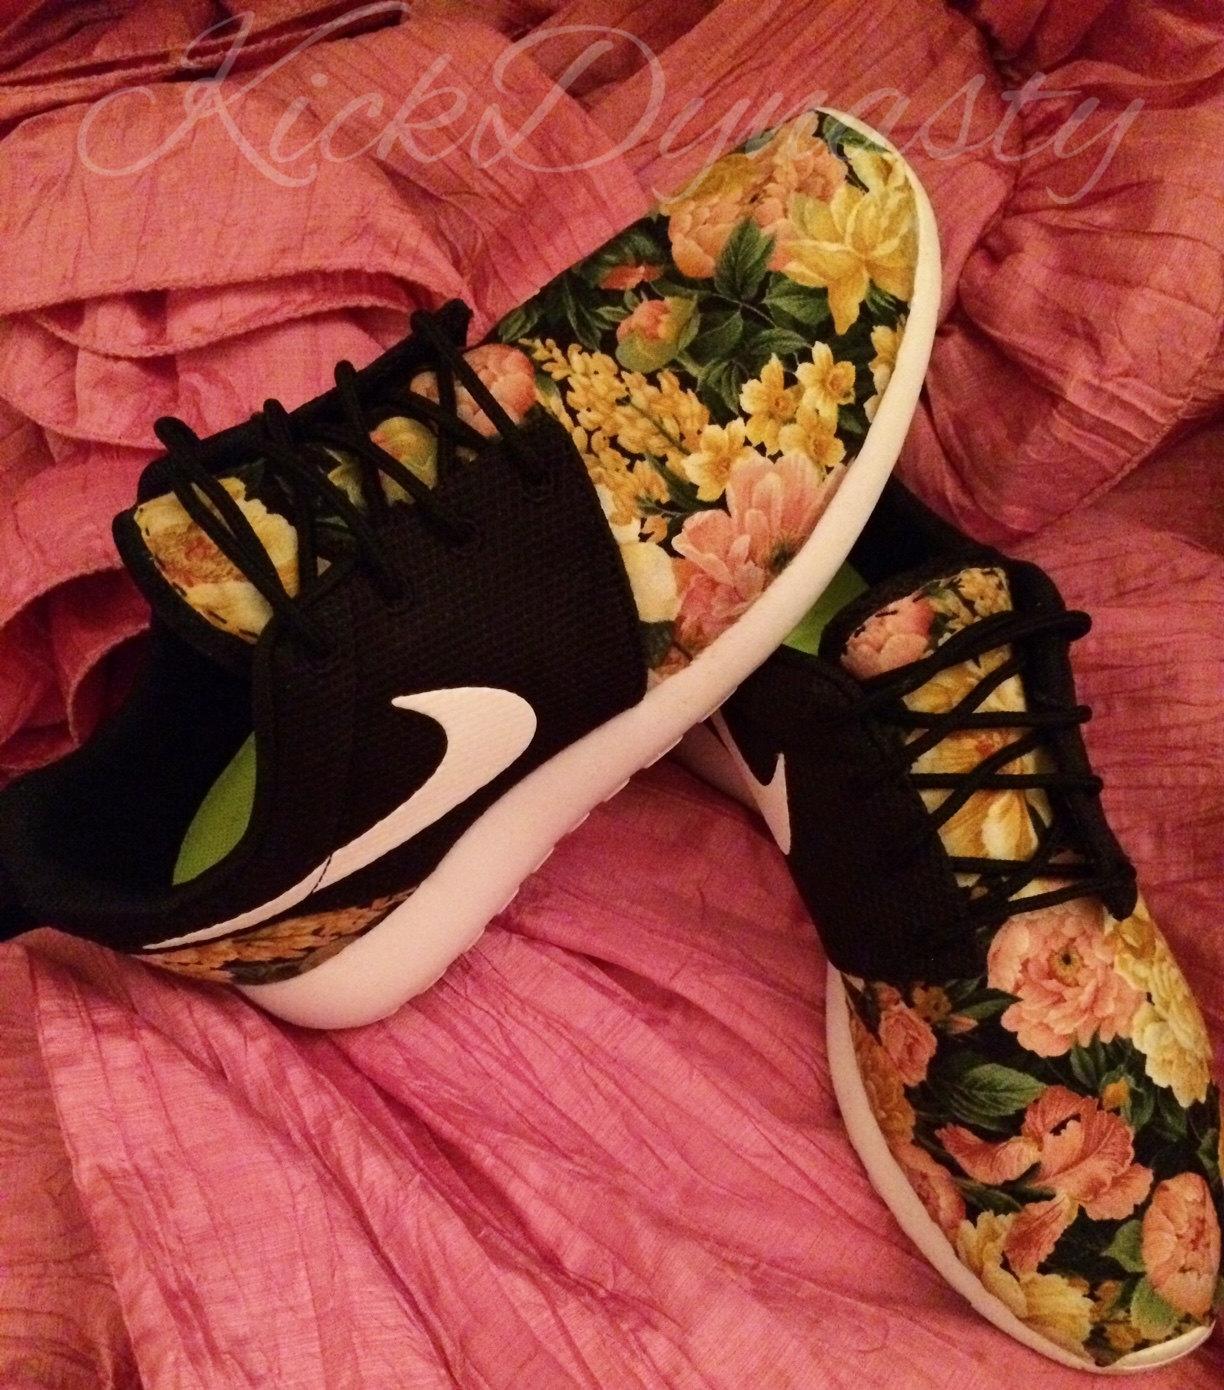 e62d8c407a9e Nike Roshe Run Floral Sneakers Supreme Style Men s   Women s Sizes